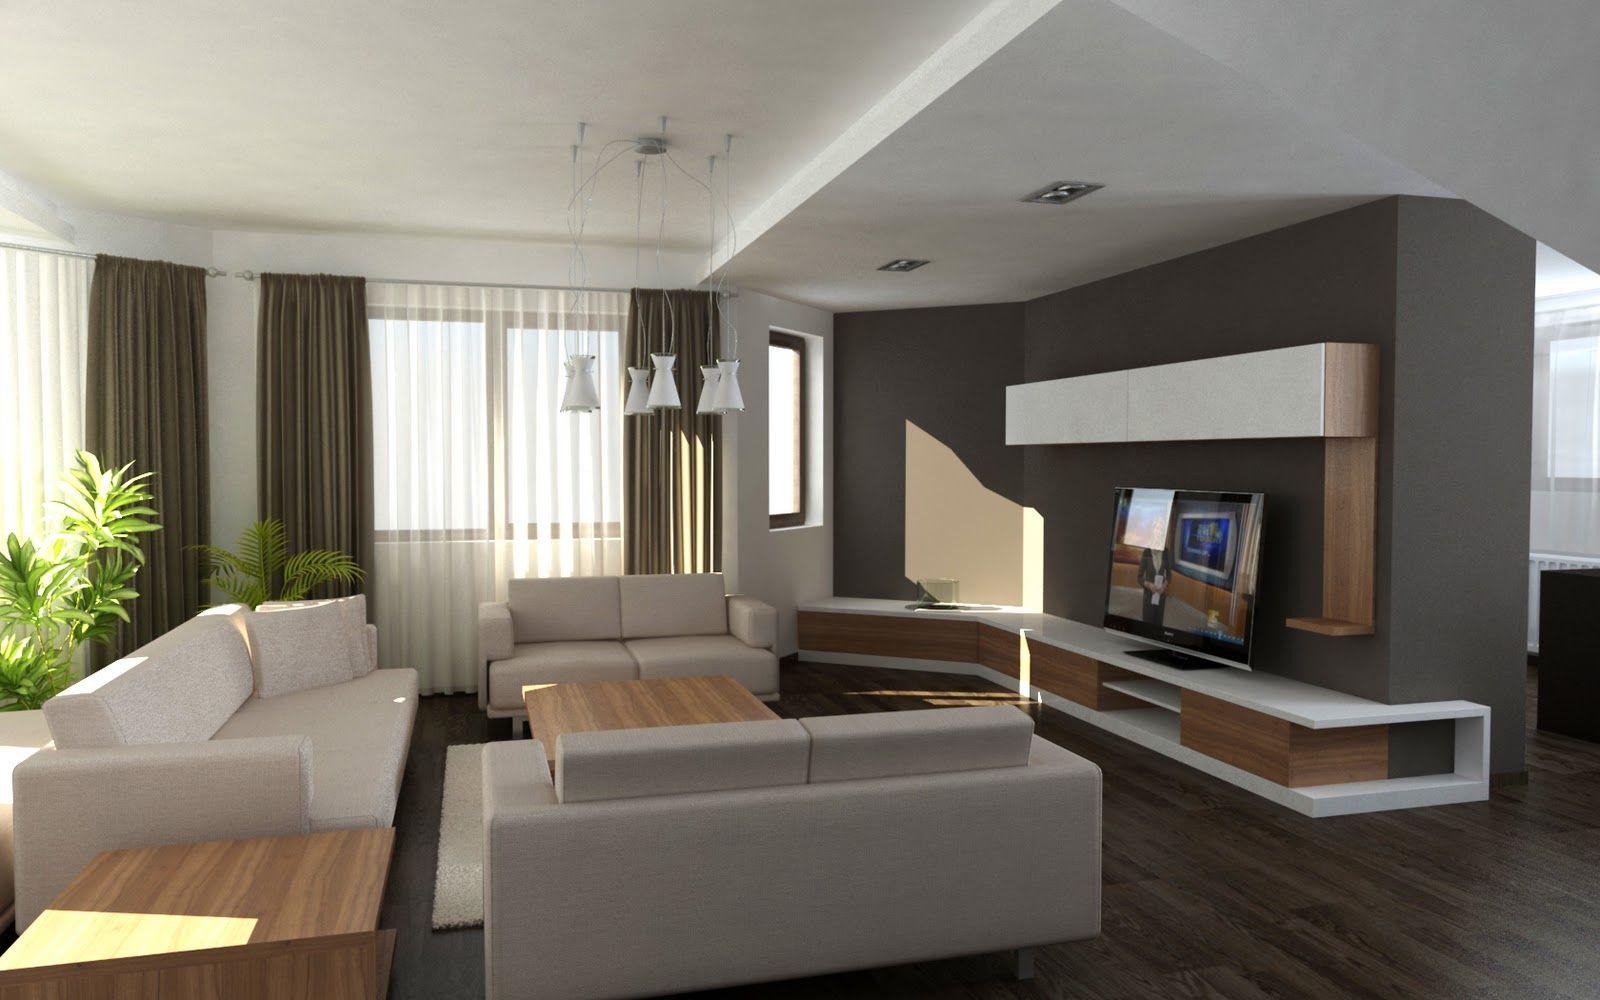 Interior de casas modernas com tecnologia buscar con - Estilos de interiorismo ...